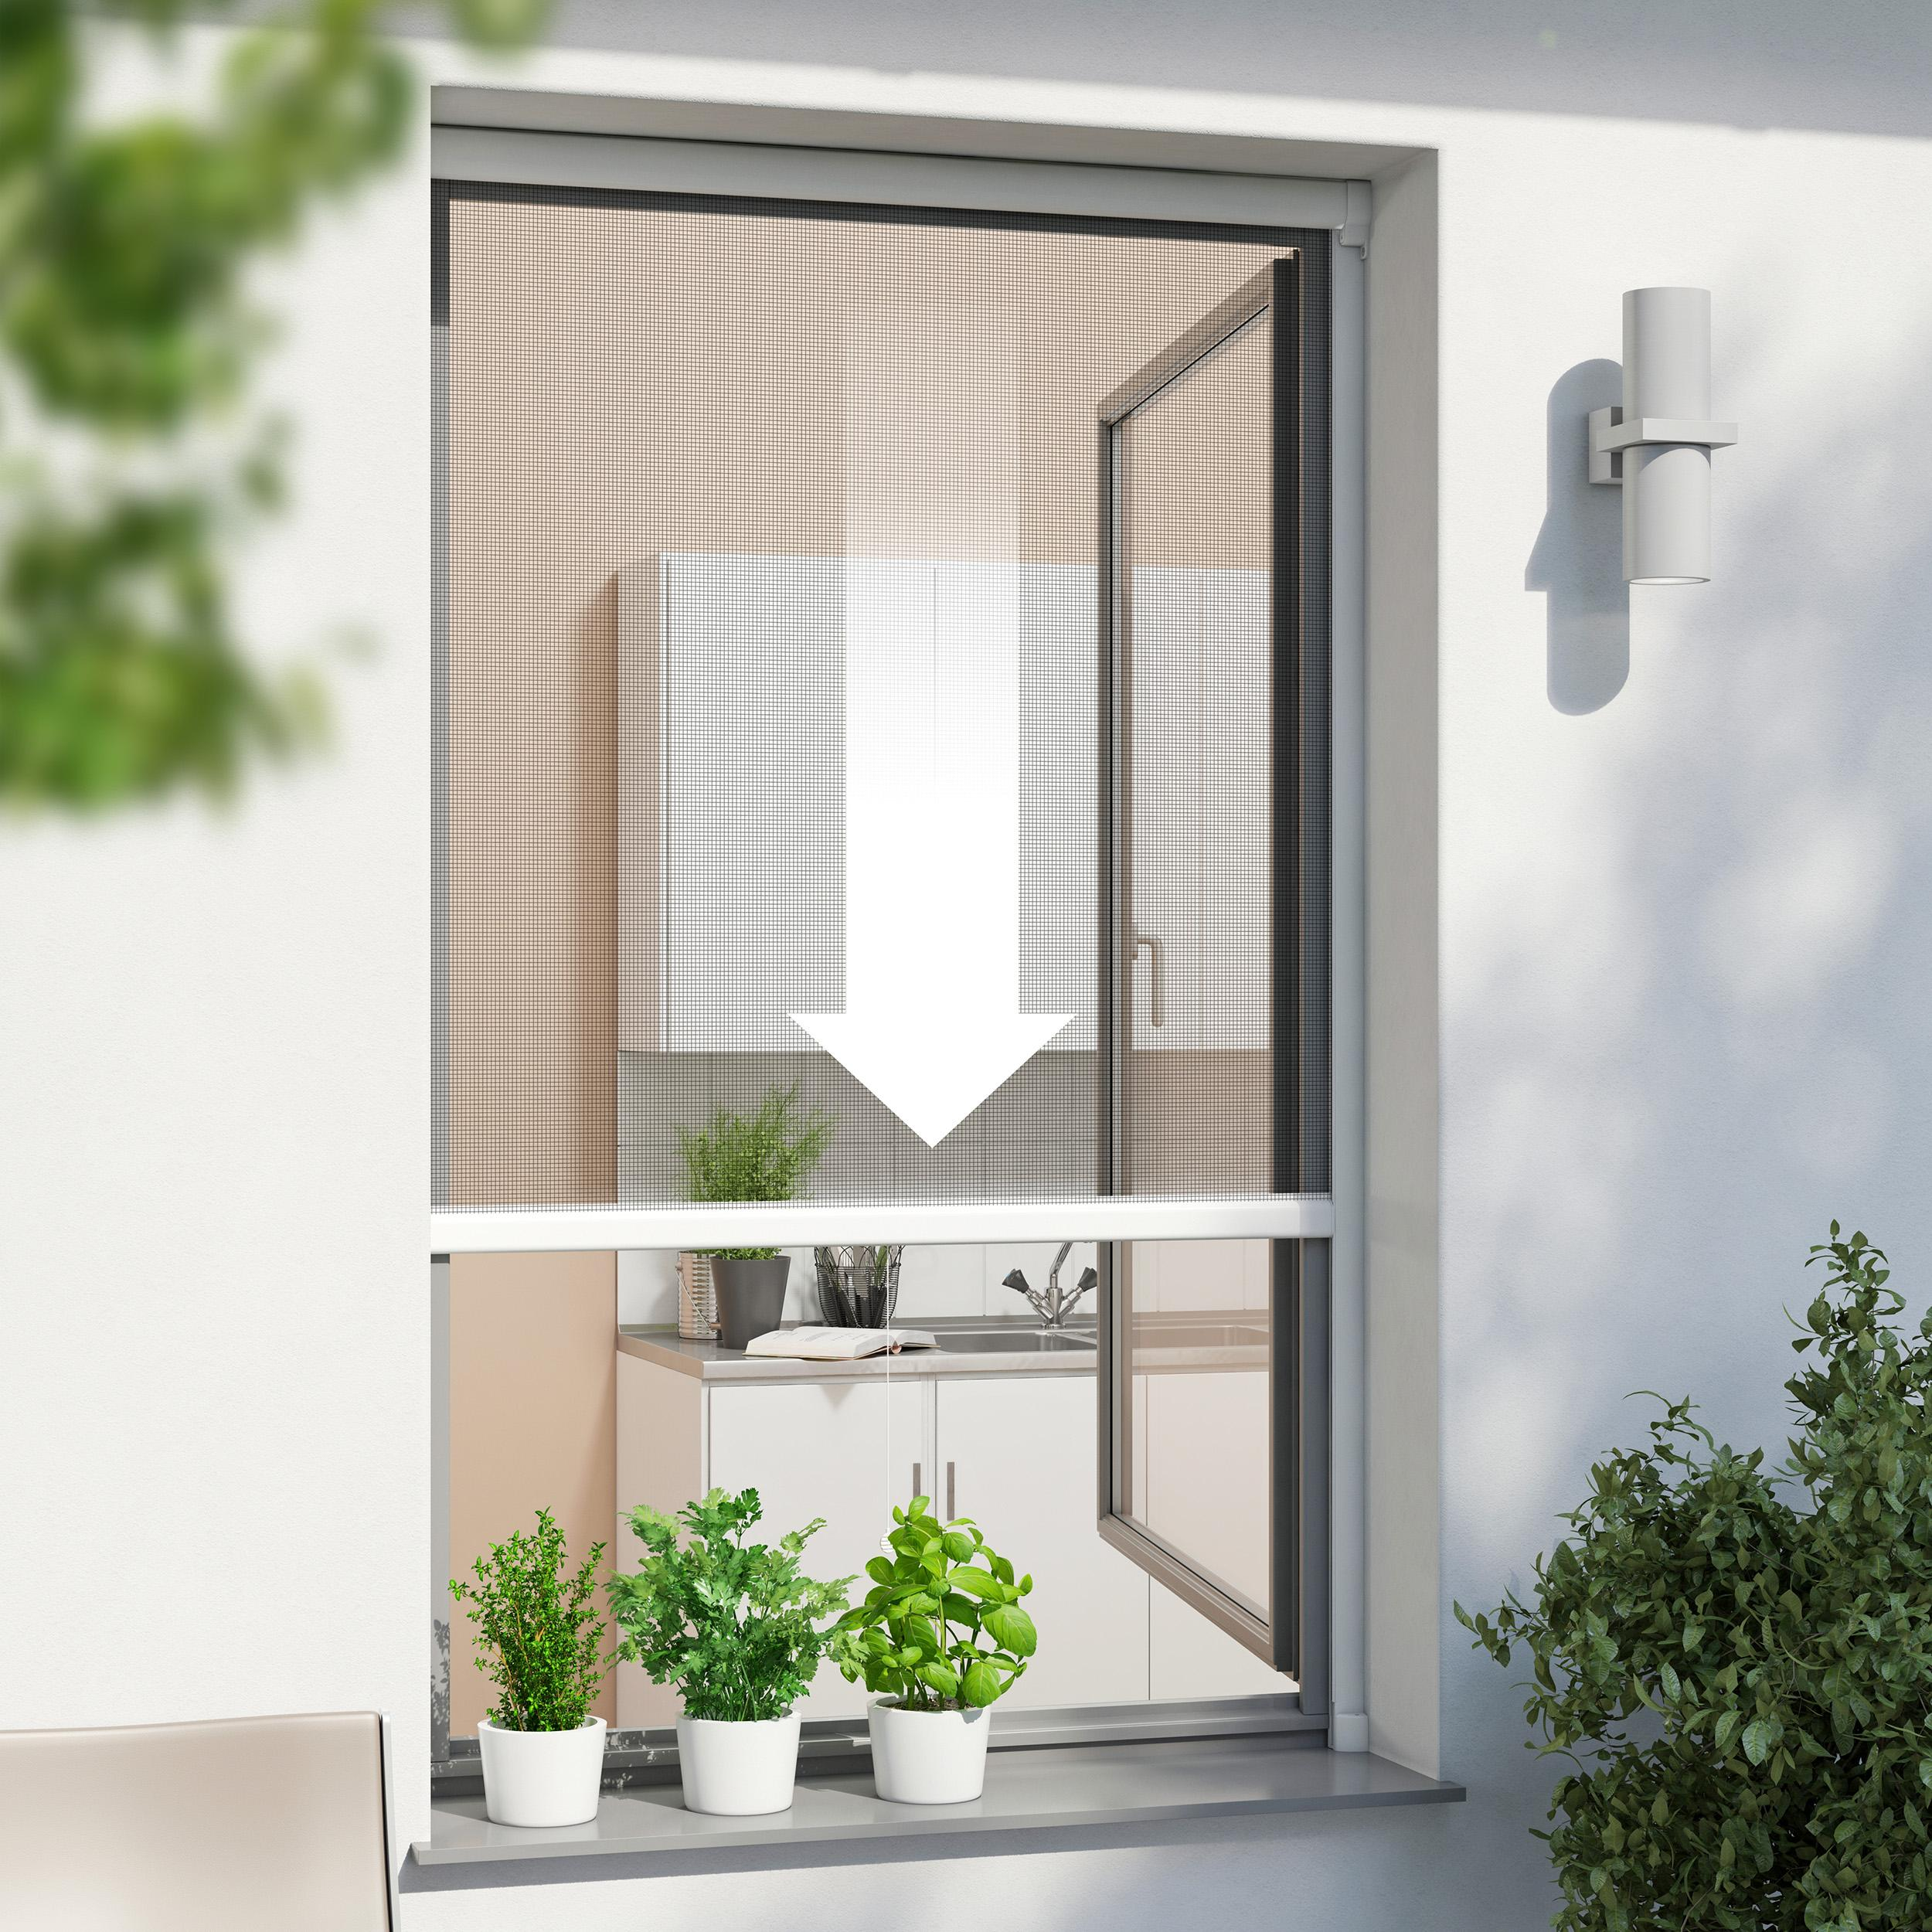 windhager insektenschutz rollo fliegengitter alurahmen f r. Black Bedroom Furniture Sets. Home Design Ideas